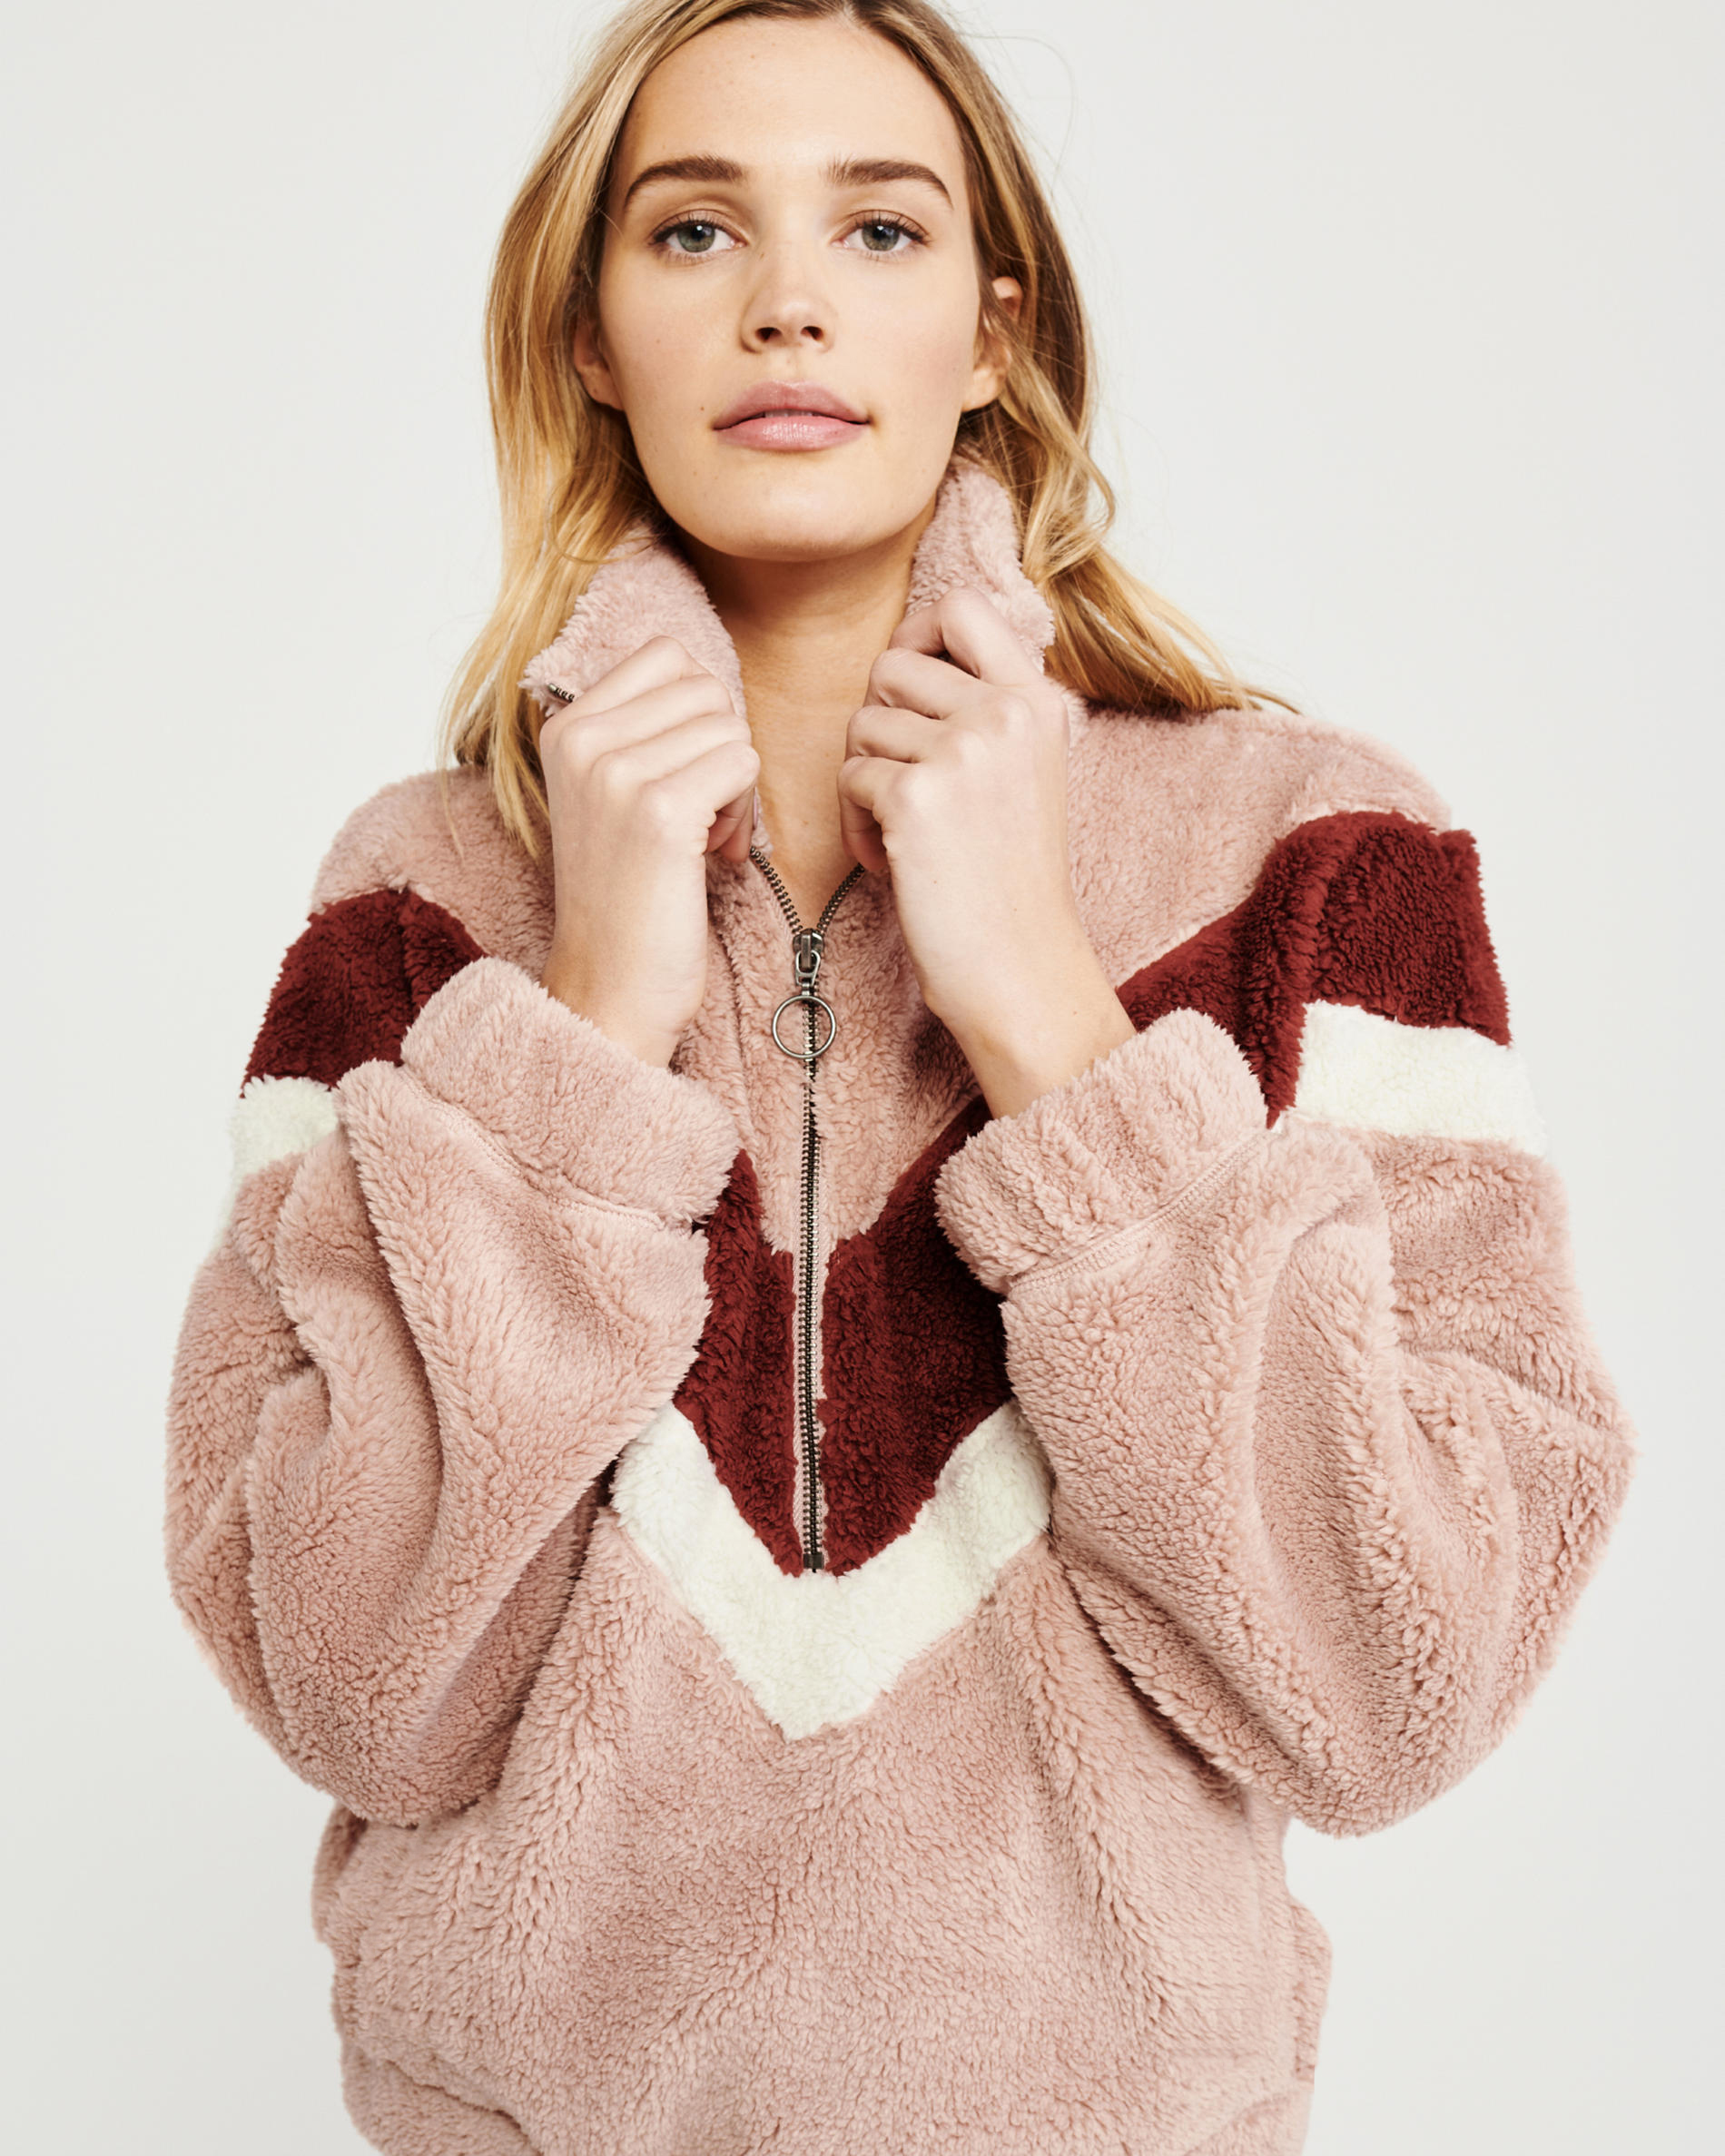 H495f53119f384685bccb2bebcca80168H New Style Women Warm Teddy Bear Fleece Pullover Coat Zip Outwear Overcoat Long Sleeve Jumper Top Pullover Winter Warm Soft Coat